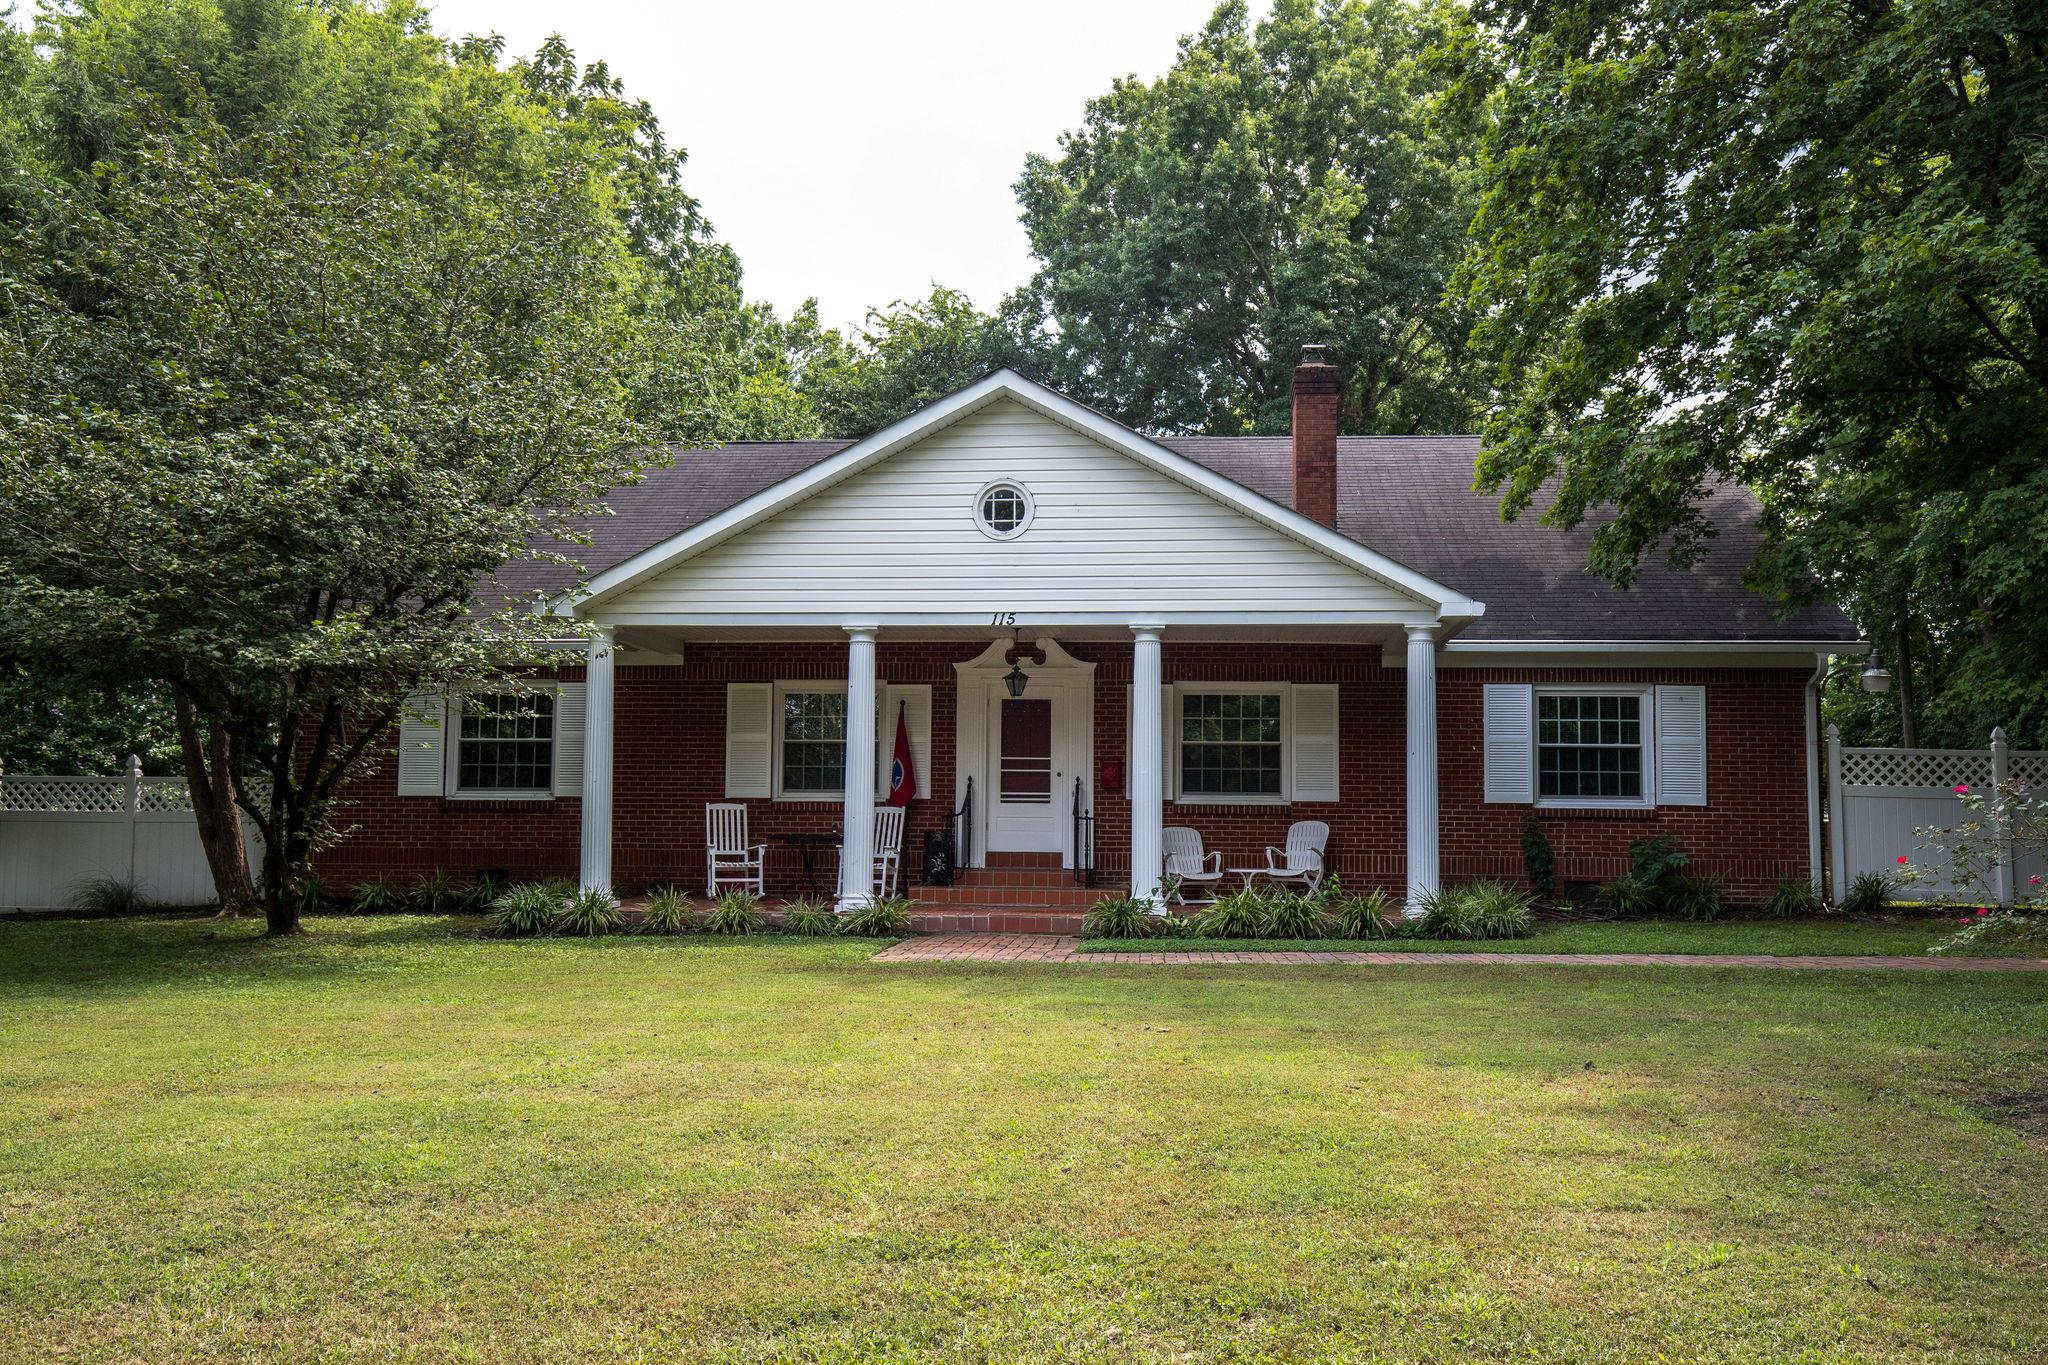 115 Hollywood St, Goodlettsville, TN 37072 - Goodlettsville, TN real estate listing